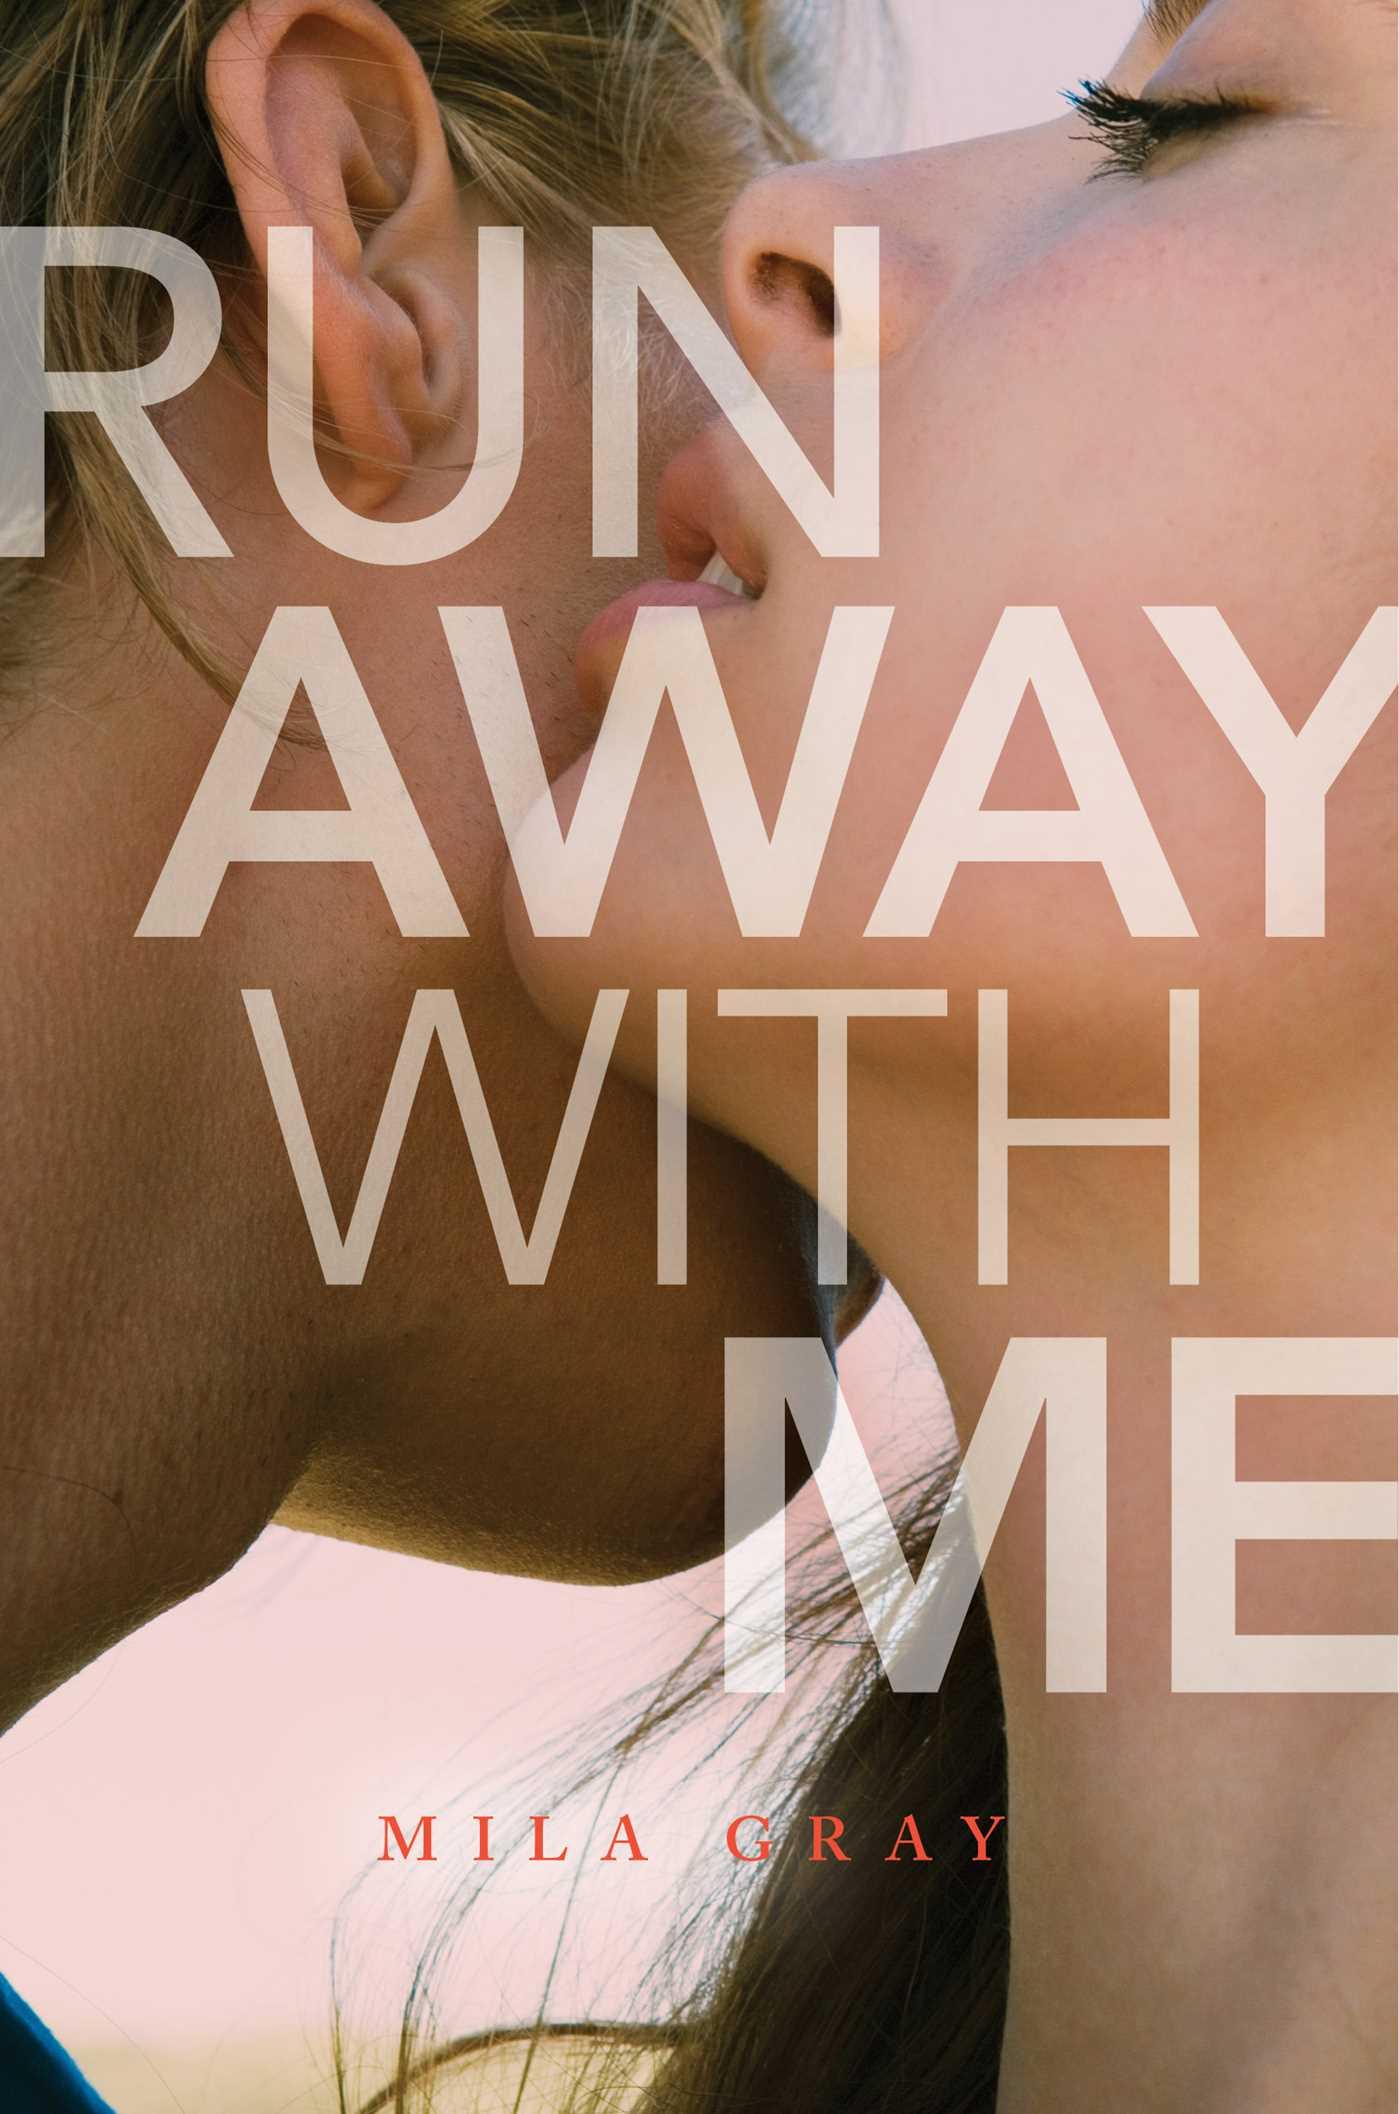 Run away with me 9781481490962 hr